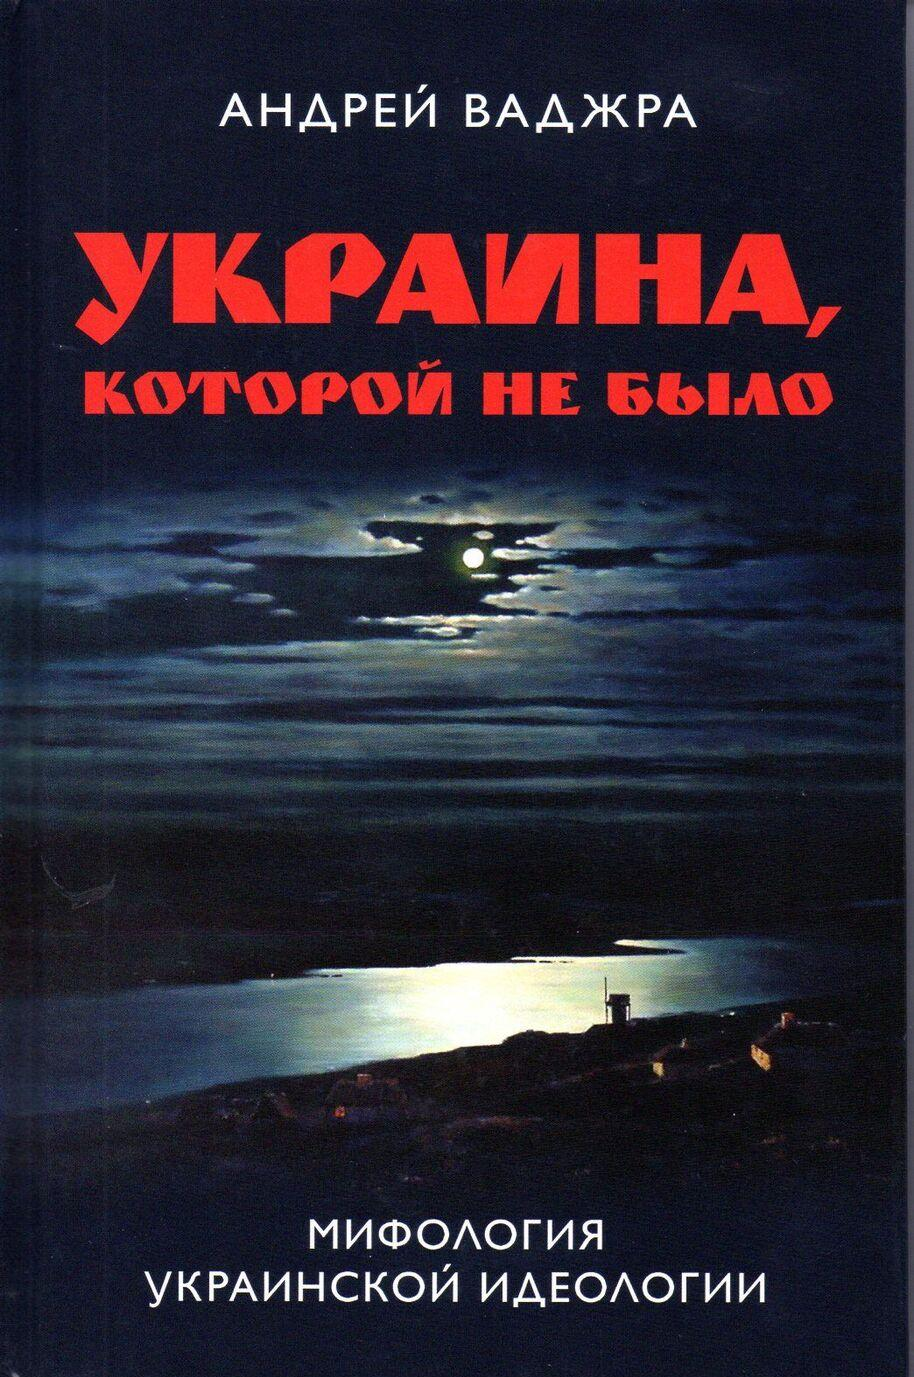 Ukraina, kotoroj ne bylo. Mifologija ukrainskoj ideologii